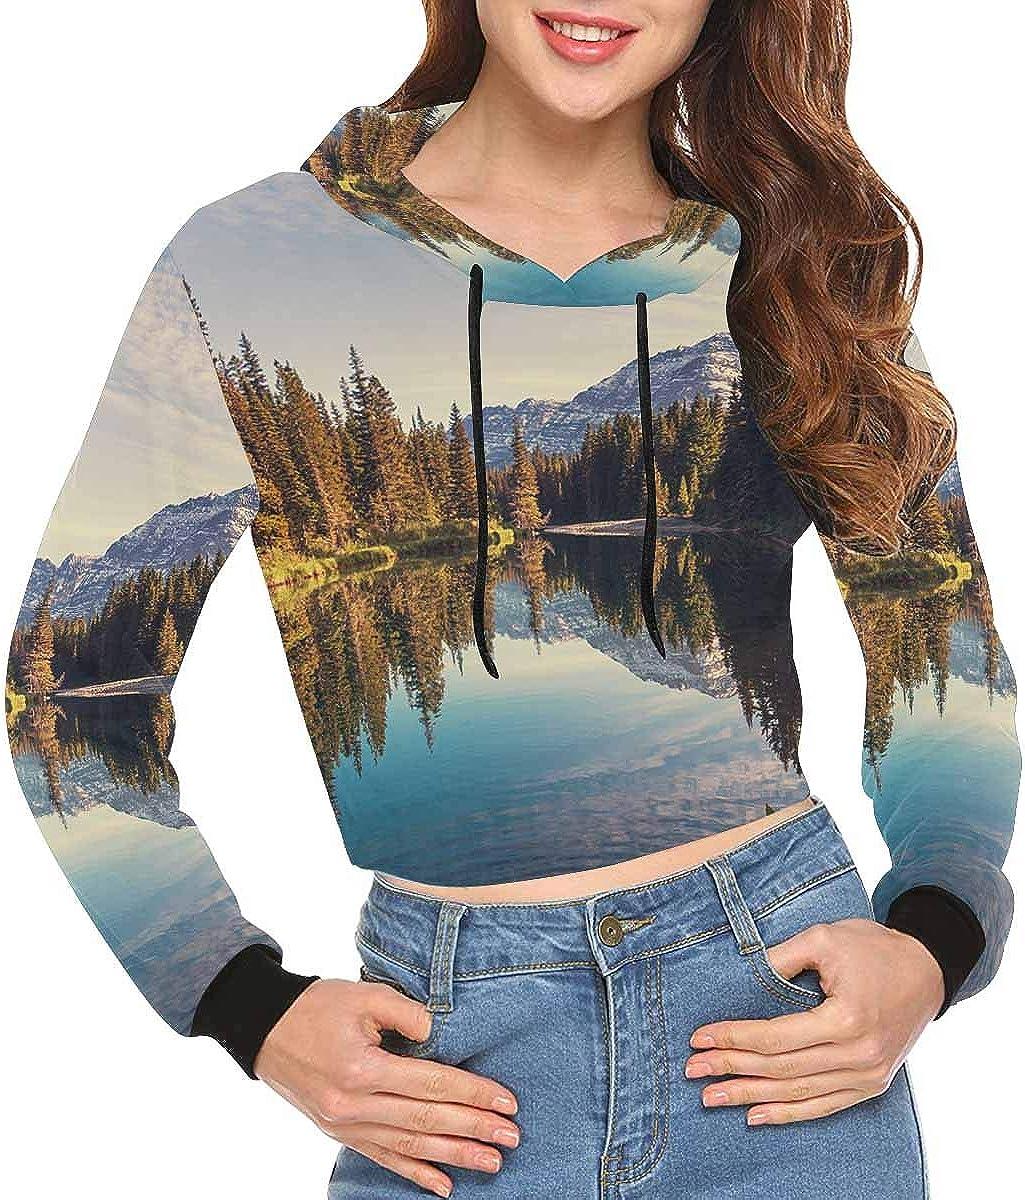 INTERESTPRINT Cropped Hoodie Women Fashion Long Sleeve Hooded Crop Tops Sweatshirt XS-2XL